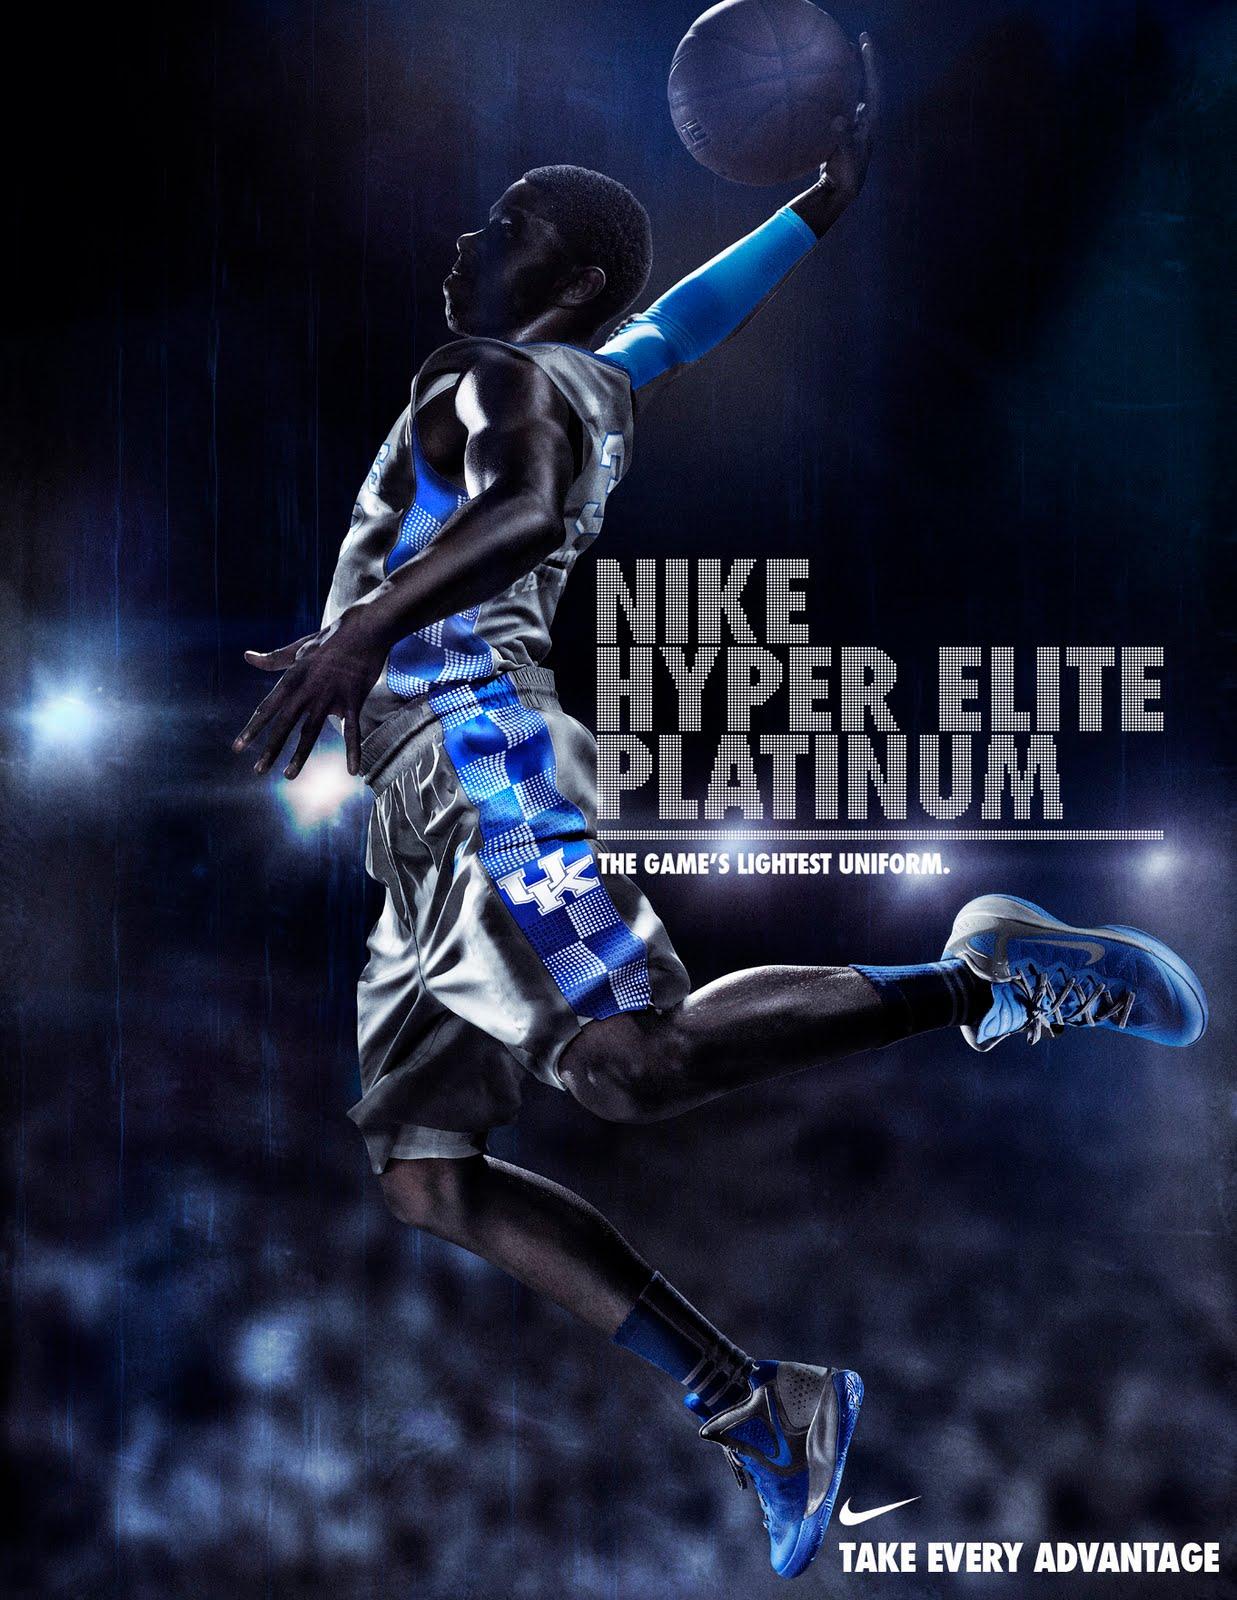 http://1.bp.blogspot.com/-7hAF-znu1OQ/TyBvNR8hjdI/AAAAAAAAIFw/P5LNqCl9444/s1600/KENTUCKY_Platinum_Elite_Page_1.jpg